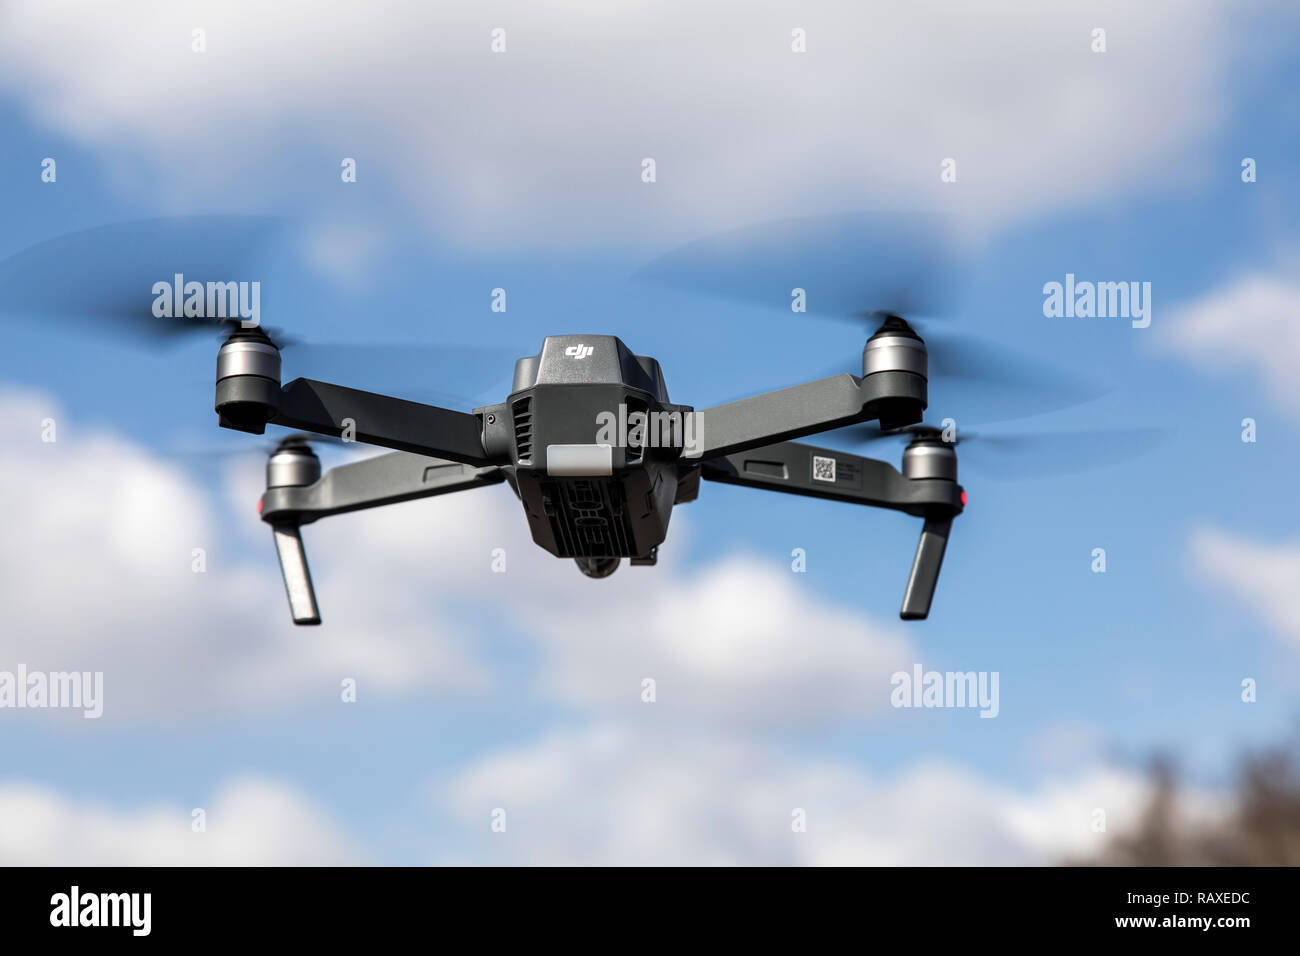 Drone, Multicopter, with Camera, Quadrocopter, Model DJI Mavic Pro, - Stock Image